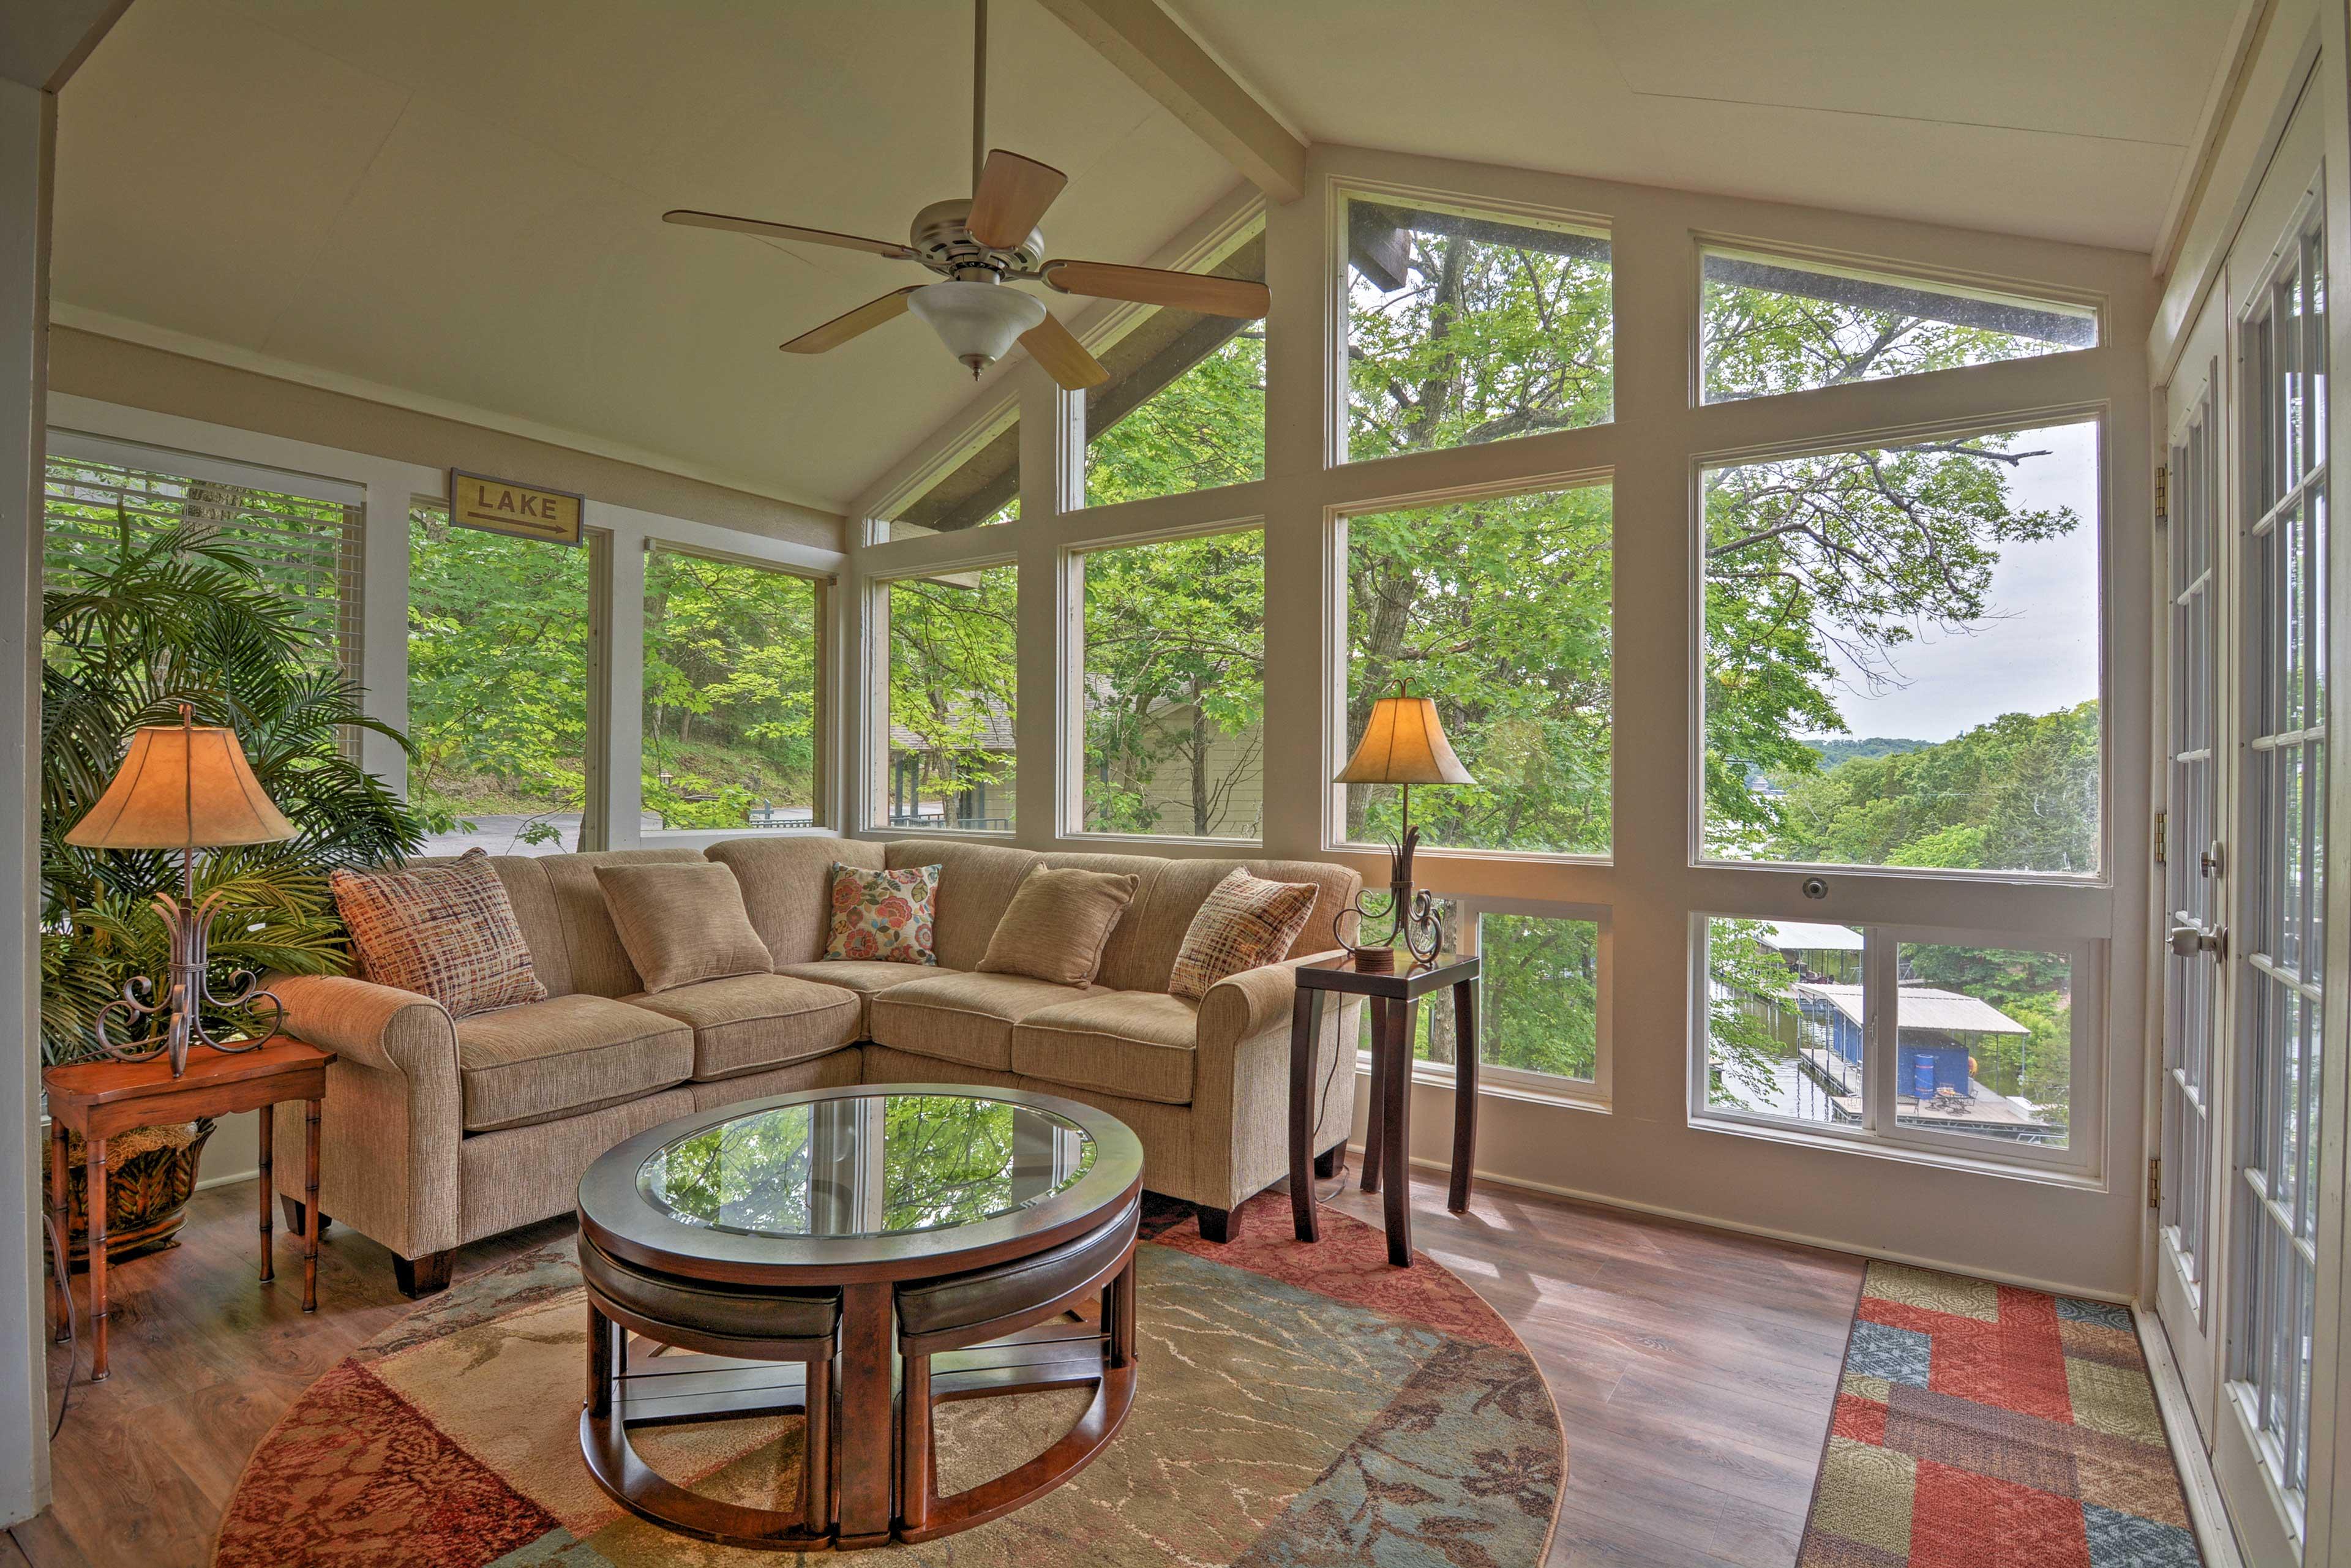 Osage Beach Vacation Rental | 5BR | 5BA | 2,600 Sq Ft | Step-Free Access